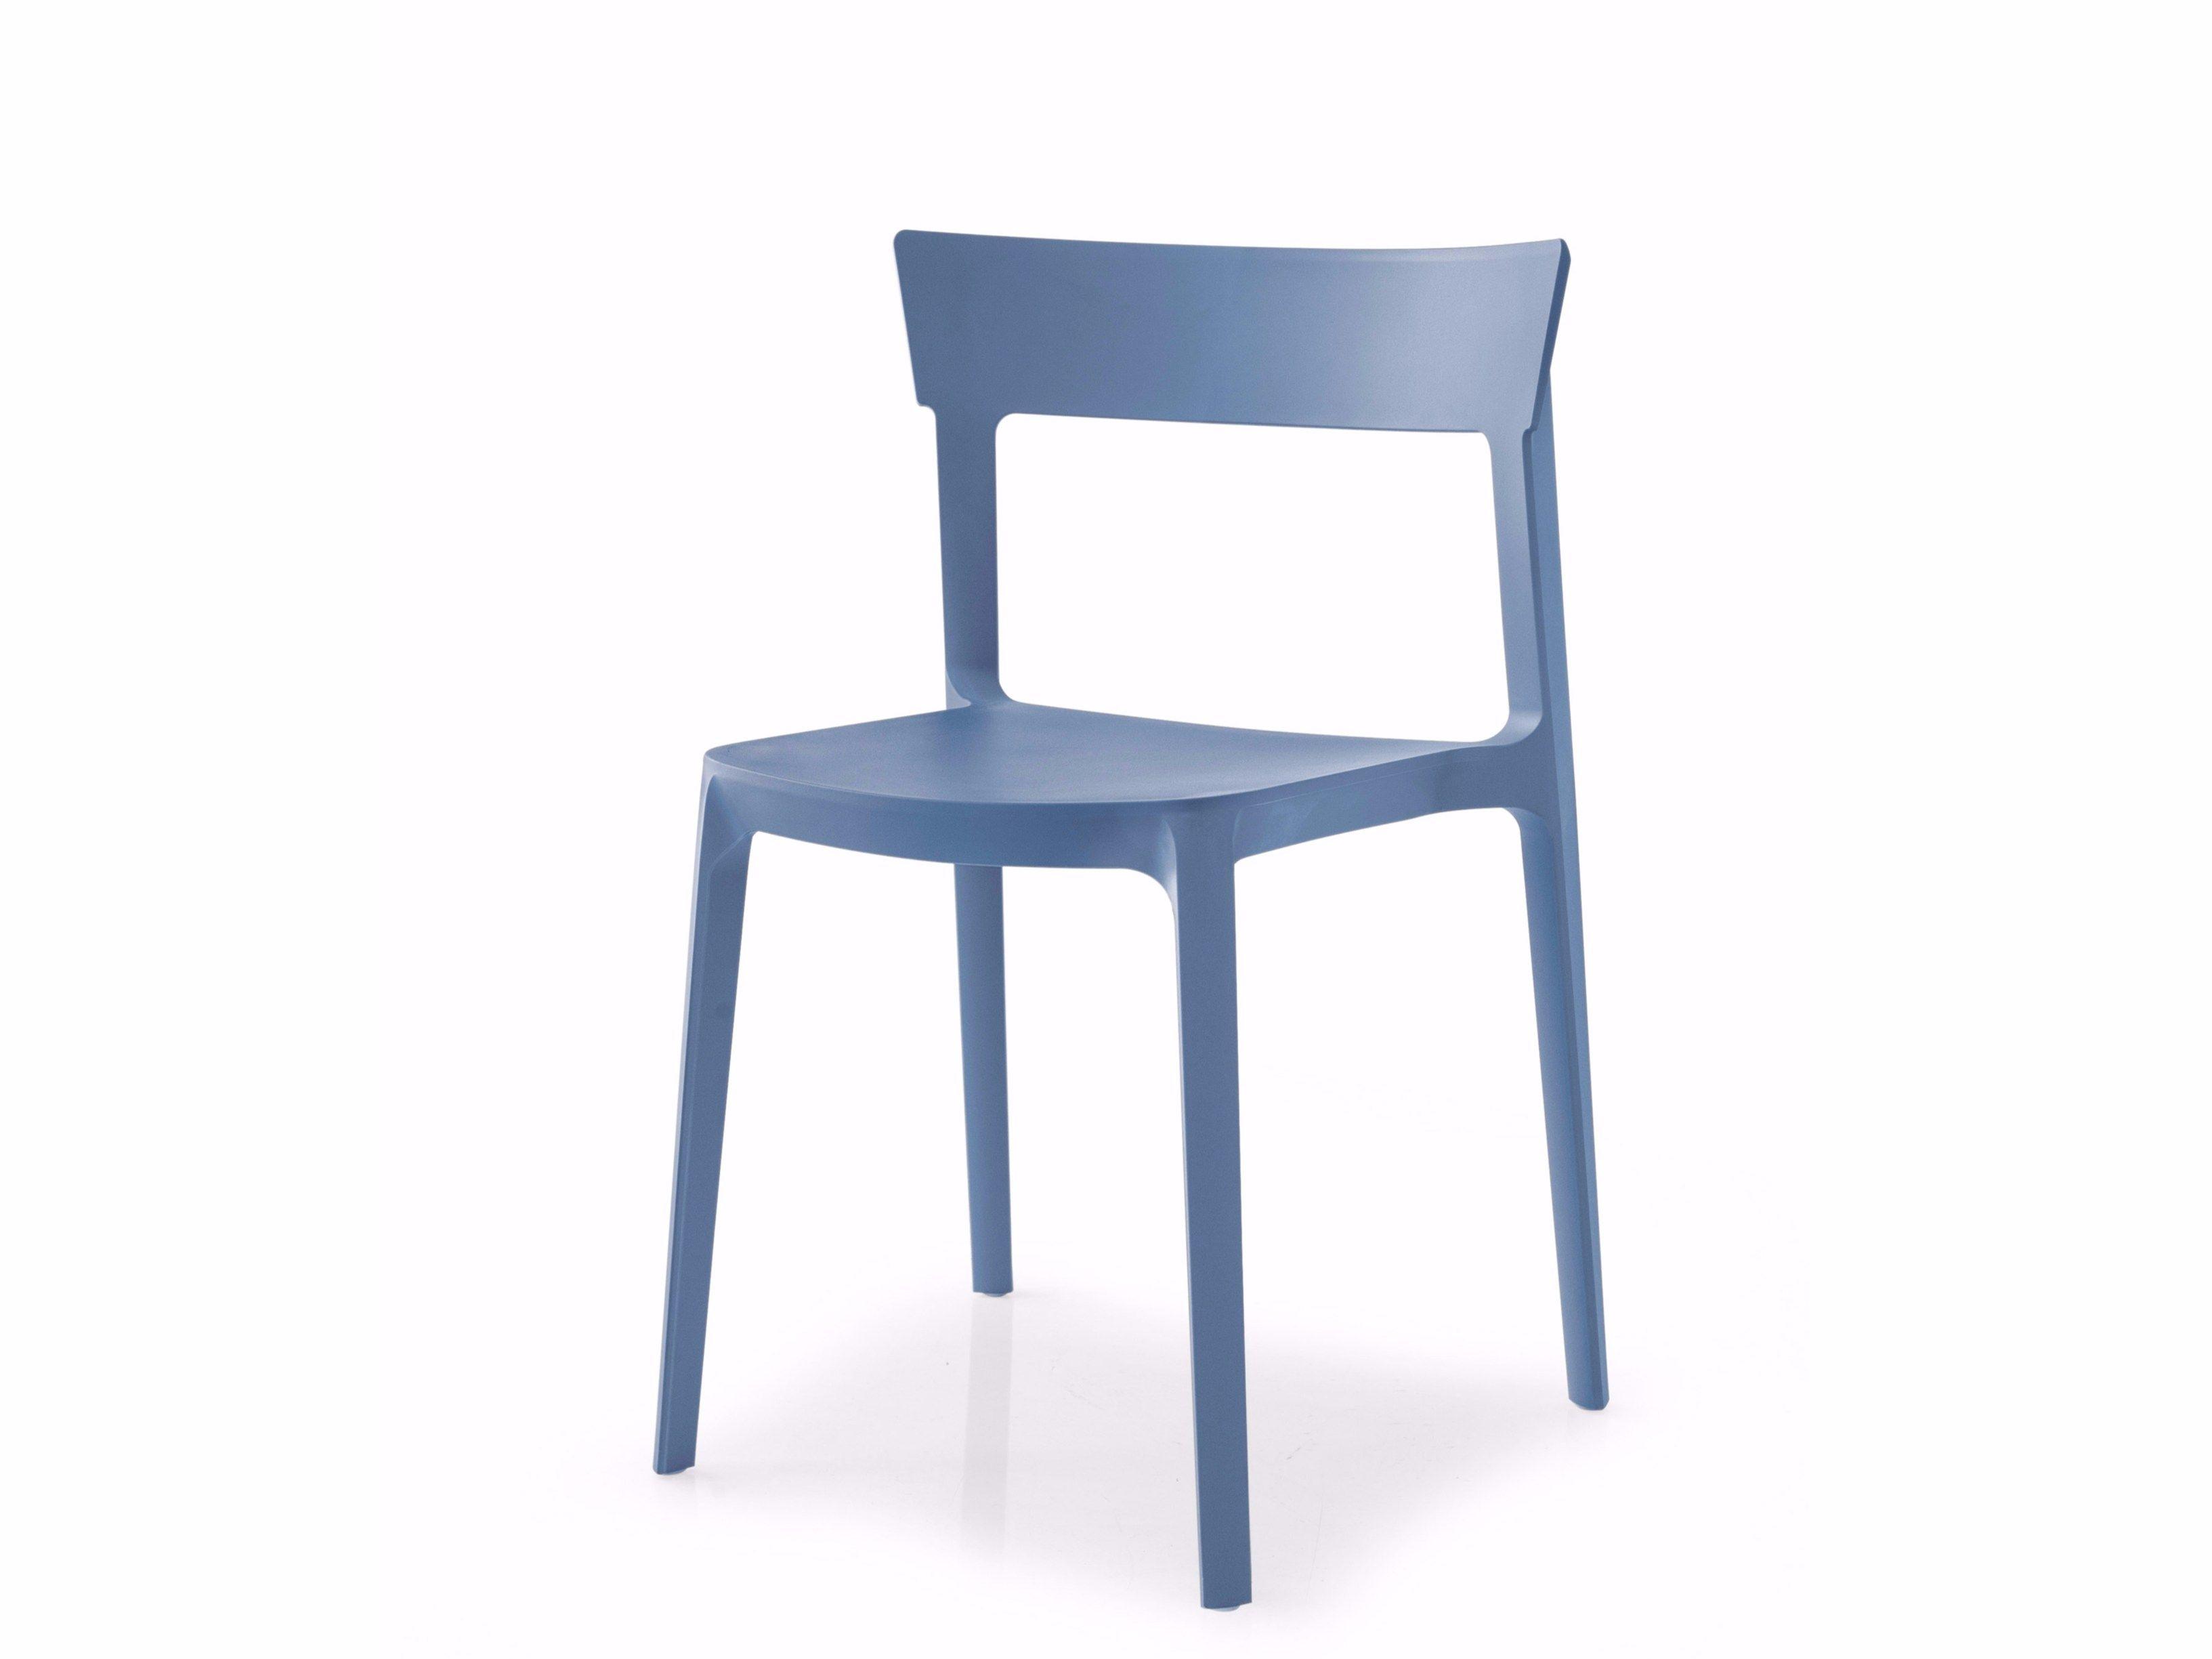 Calligaris Skin Stacking Chair Blue 170usd Calligaris Chair